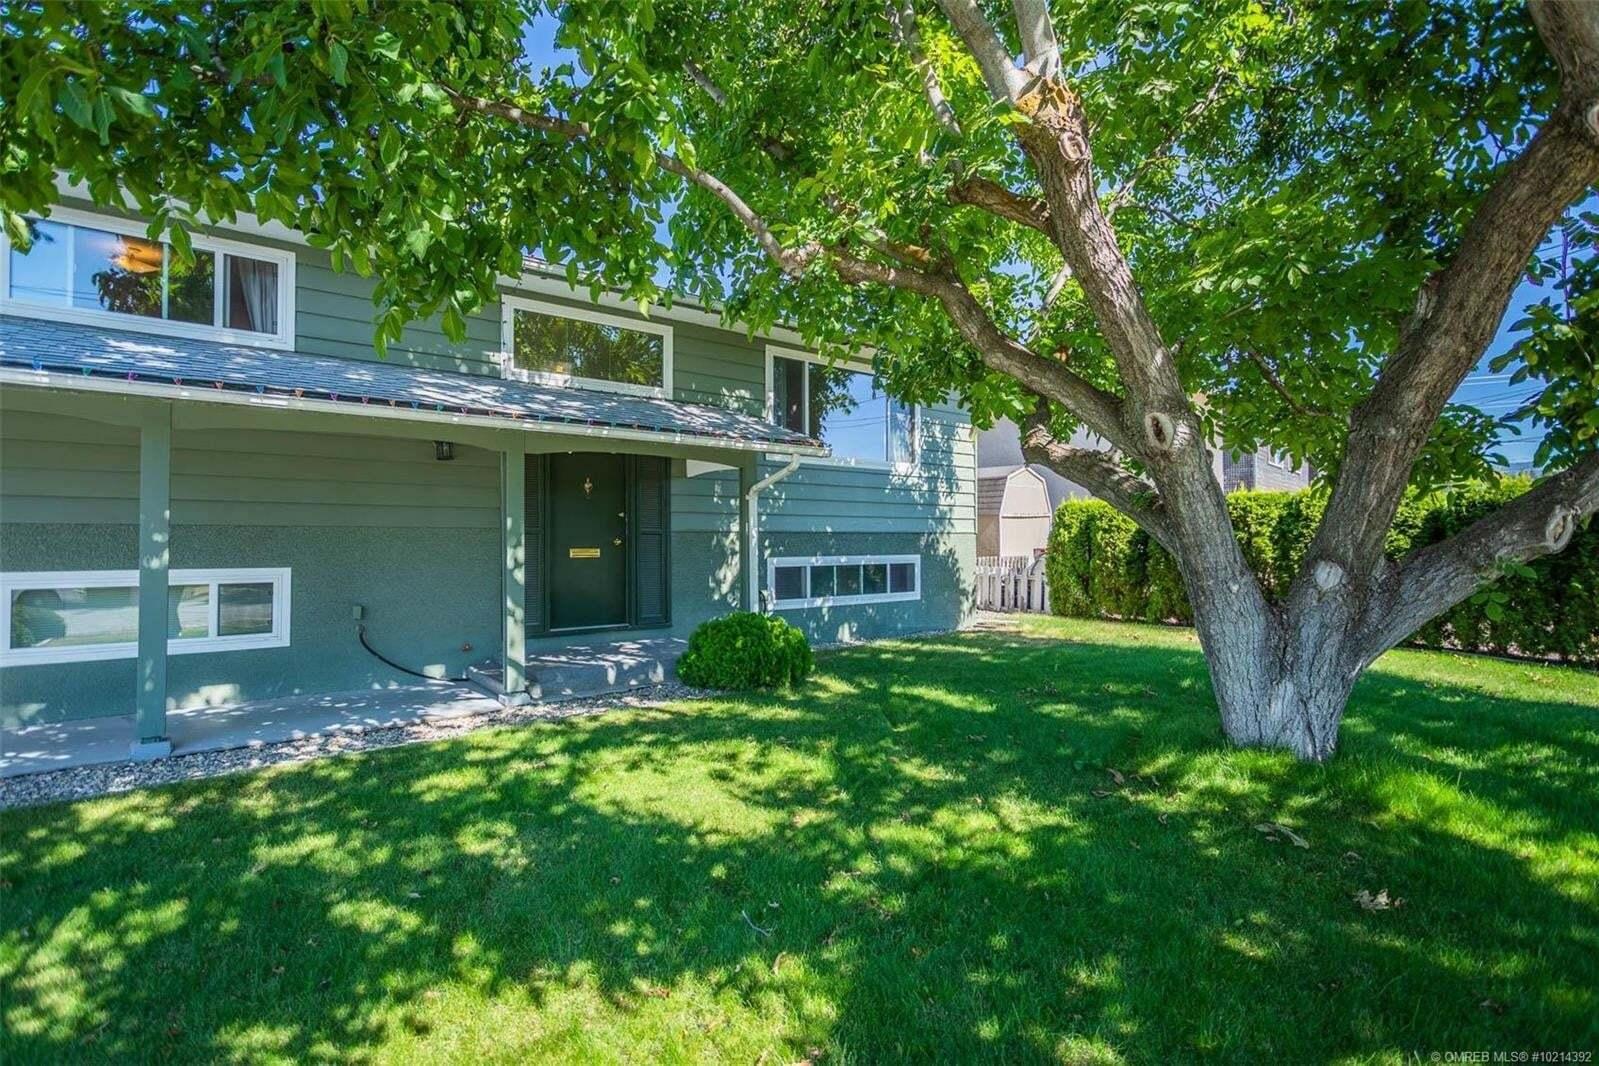 House for sale at 660 Falkirk Rd Kelowna British Columbia - MLS: 10214392